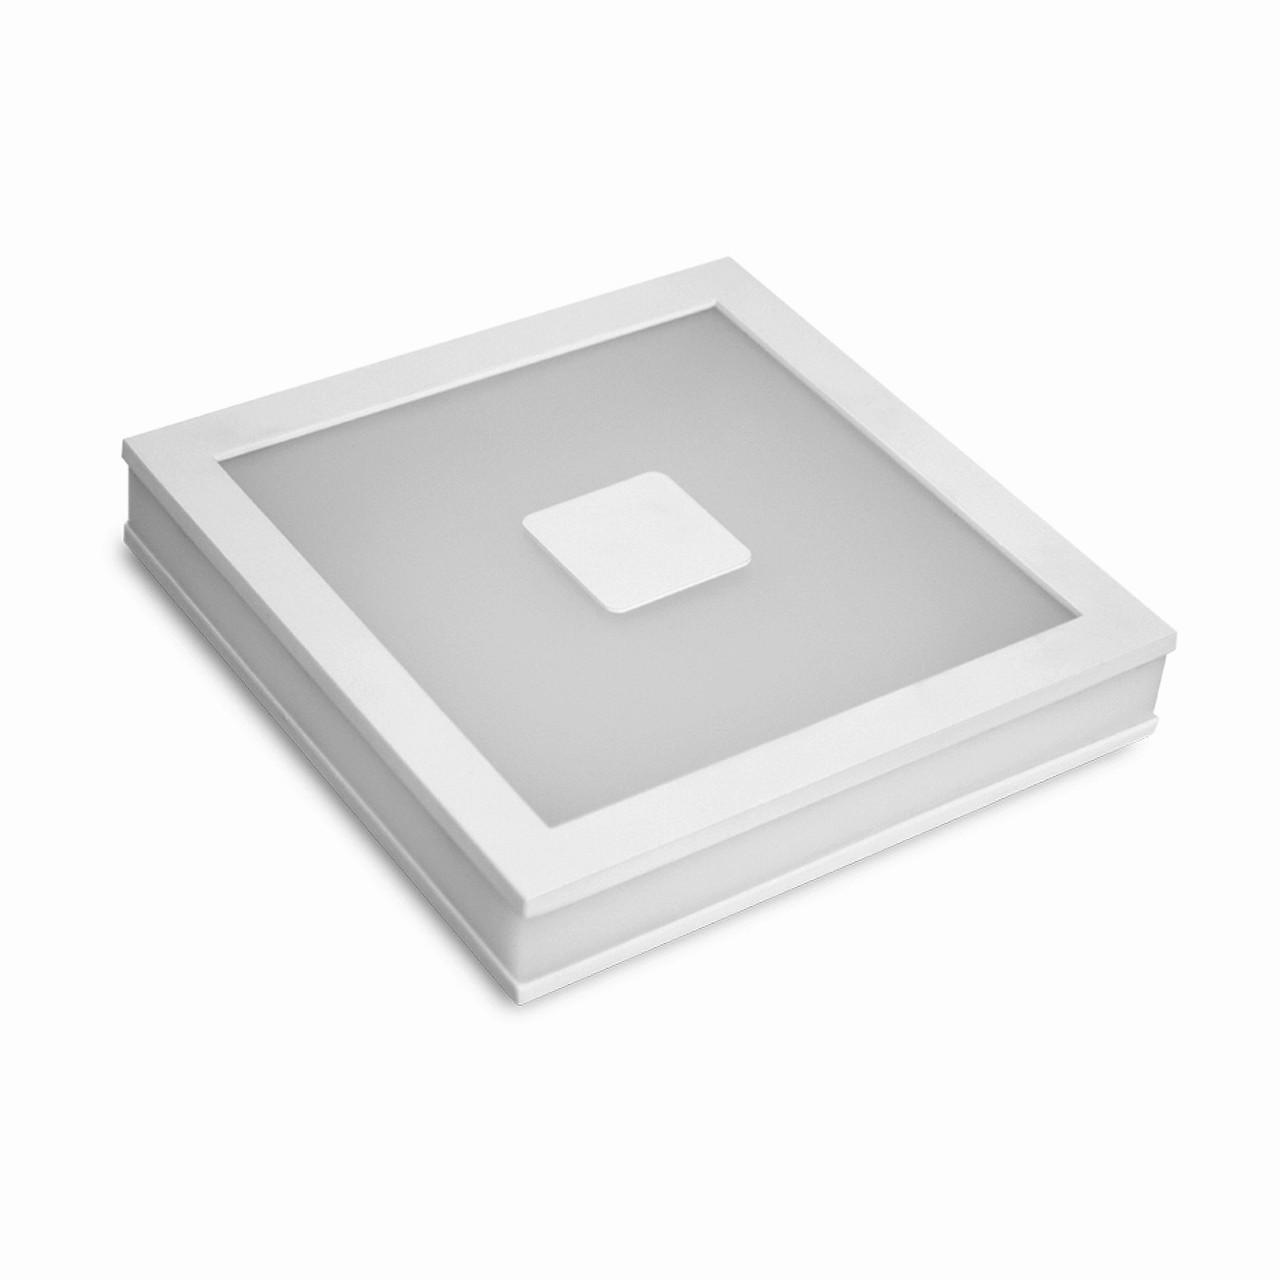 LED-светильник Eurolamp Downlight NEW 24W 2550Lm Ra93 4000K квадратный